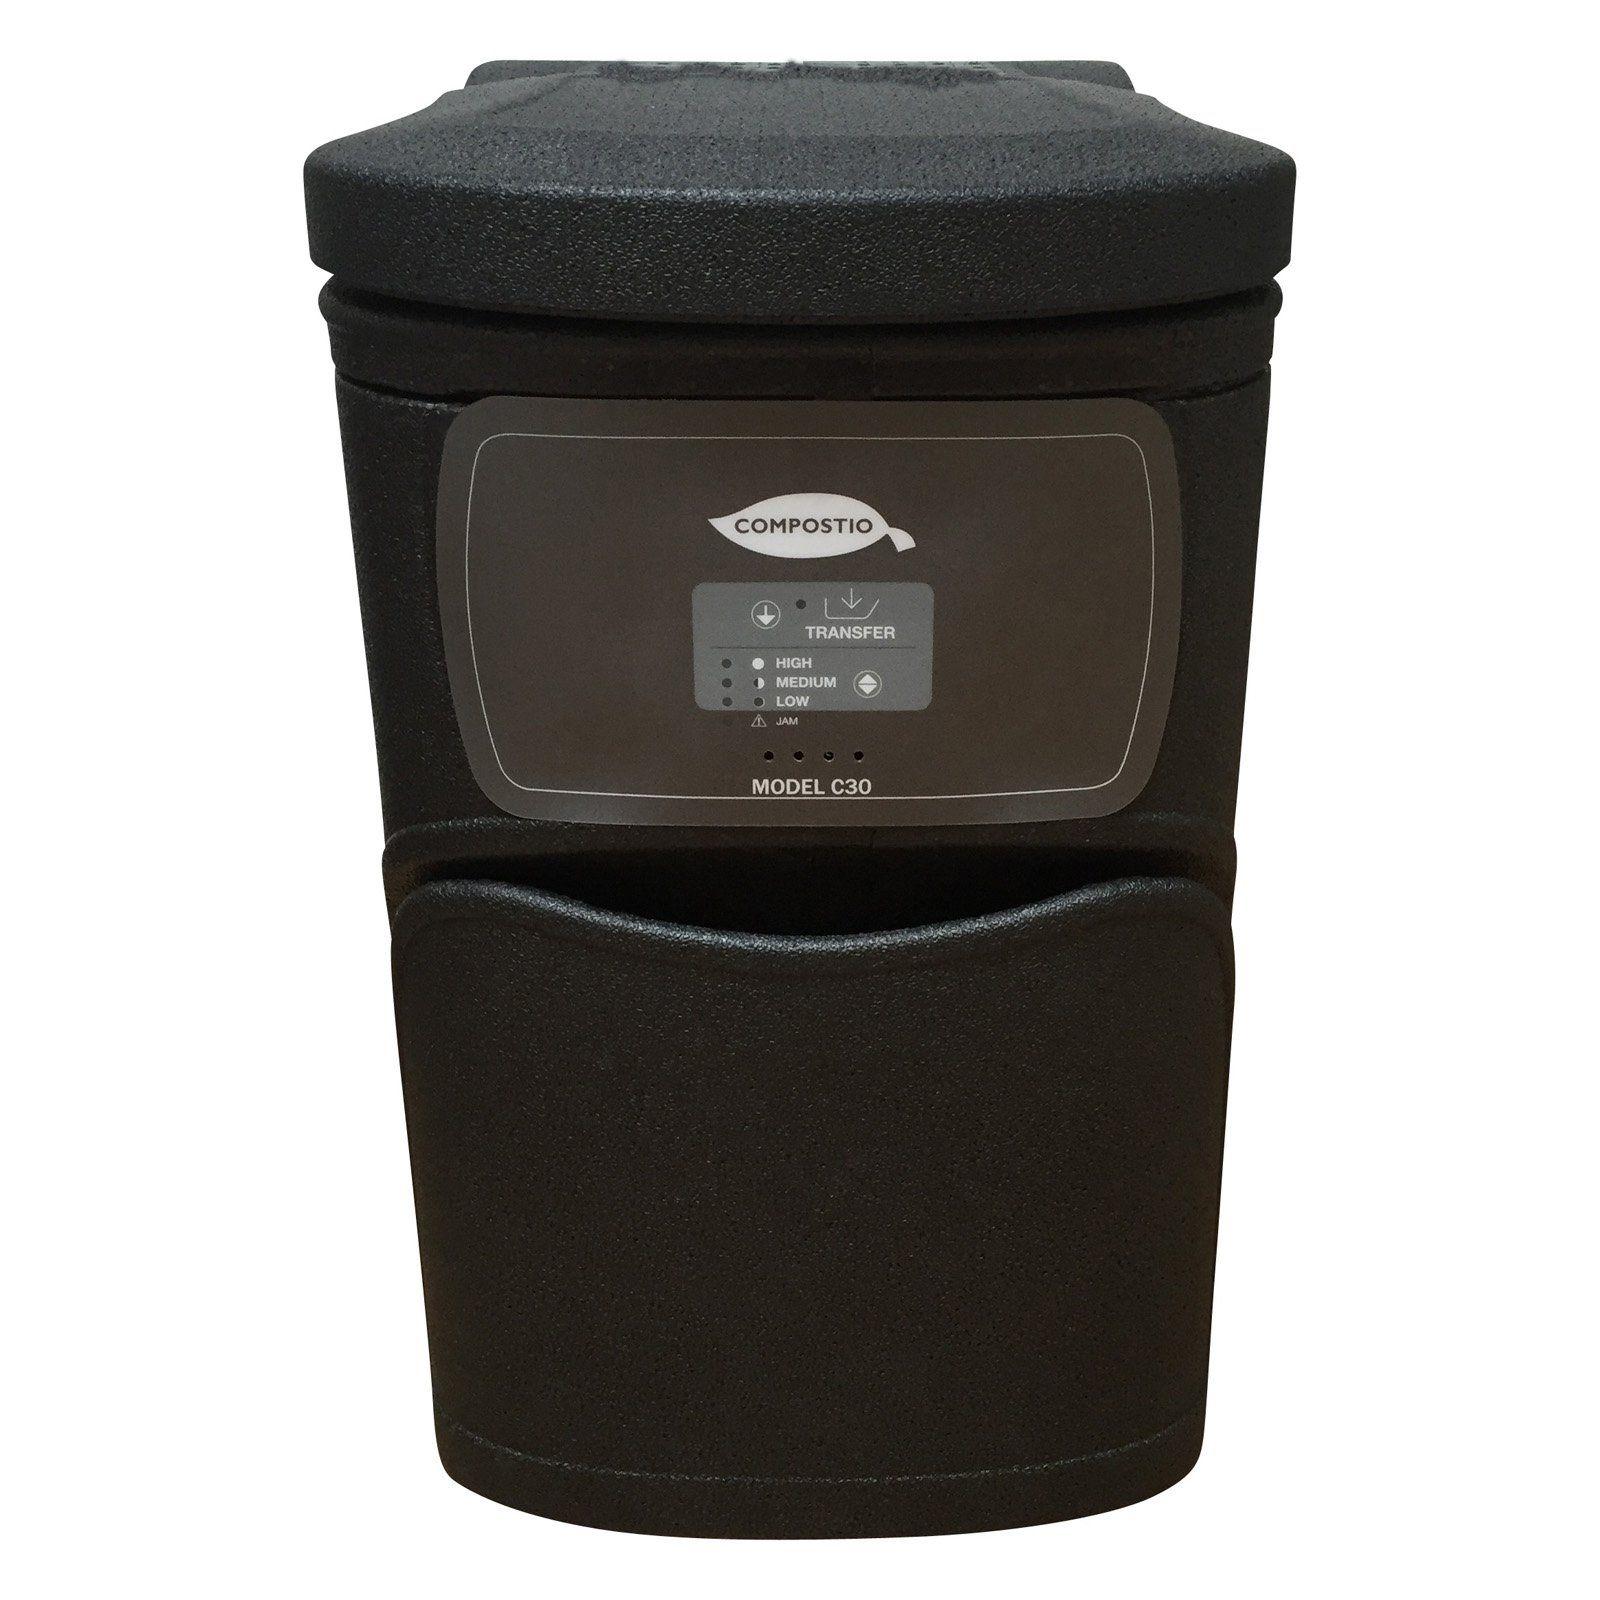 Compostio C30 Kitchen Composter Composter